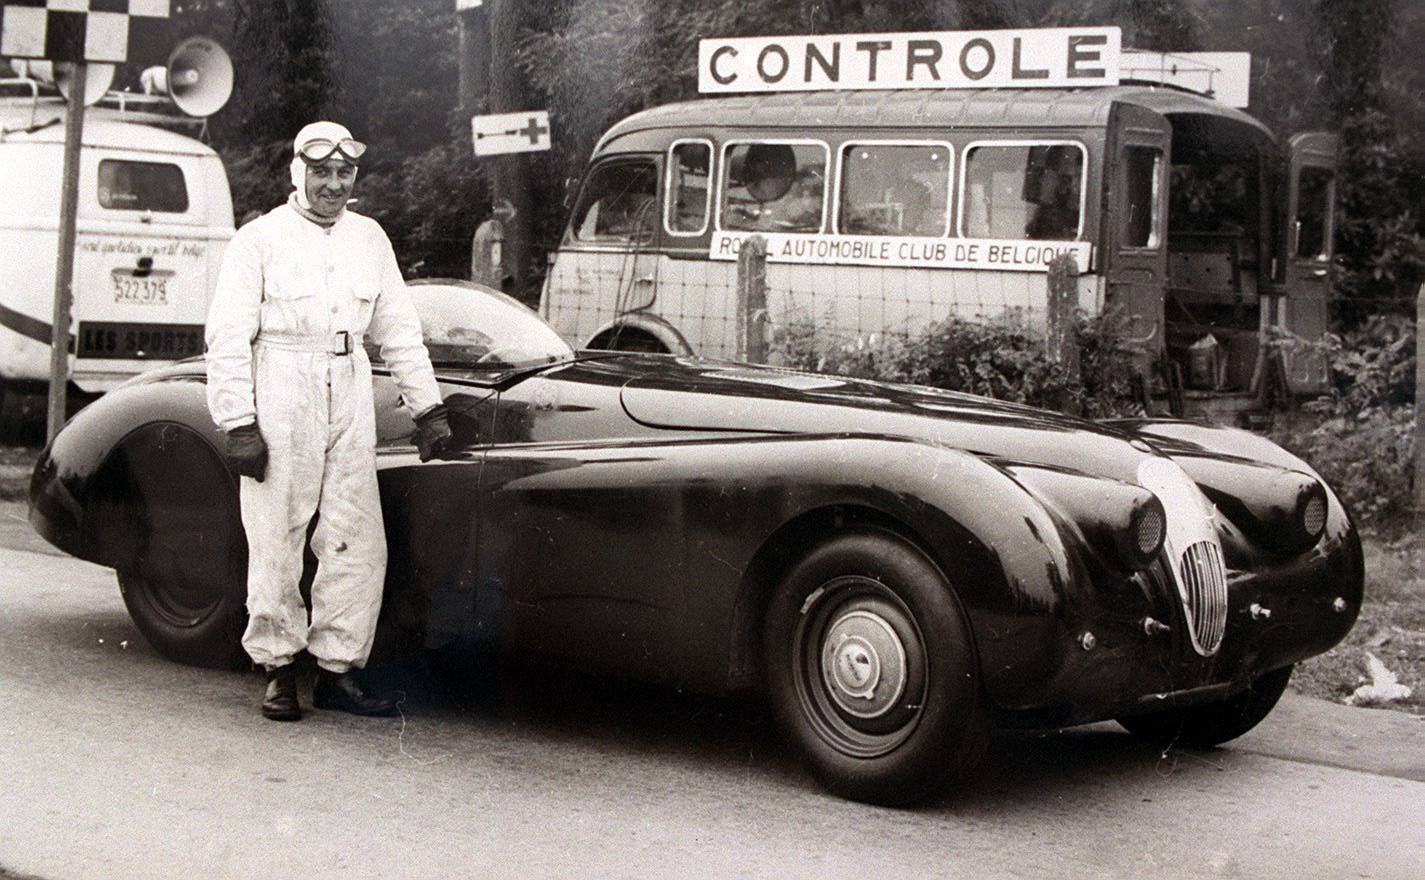 Tributes to Jaguar's king of speed